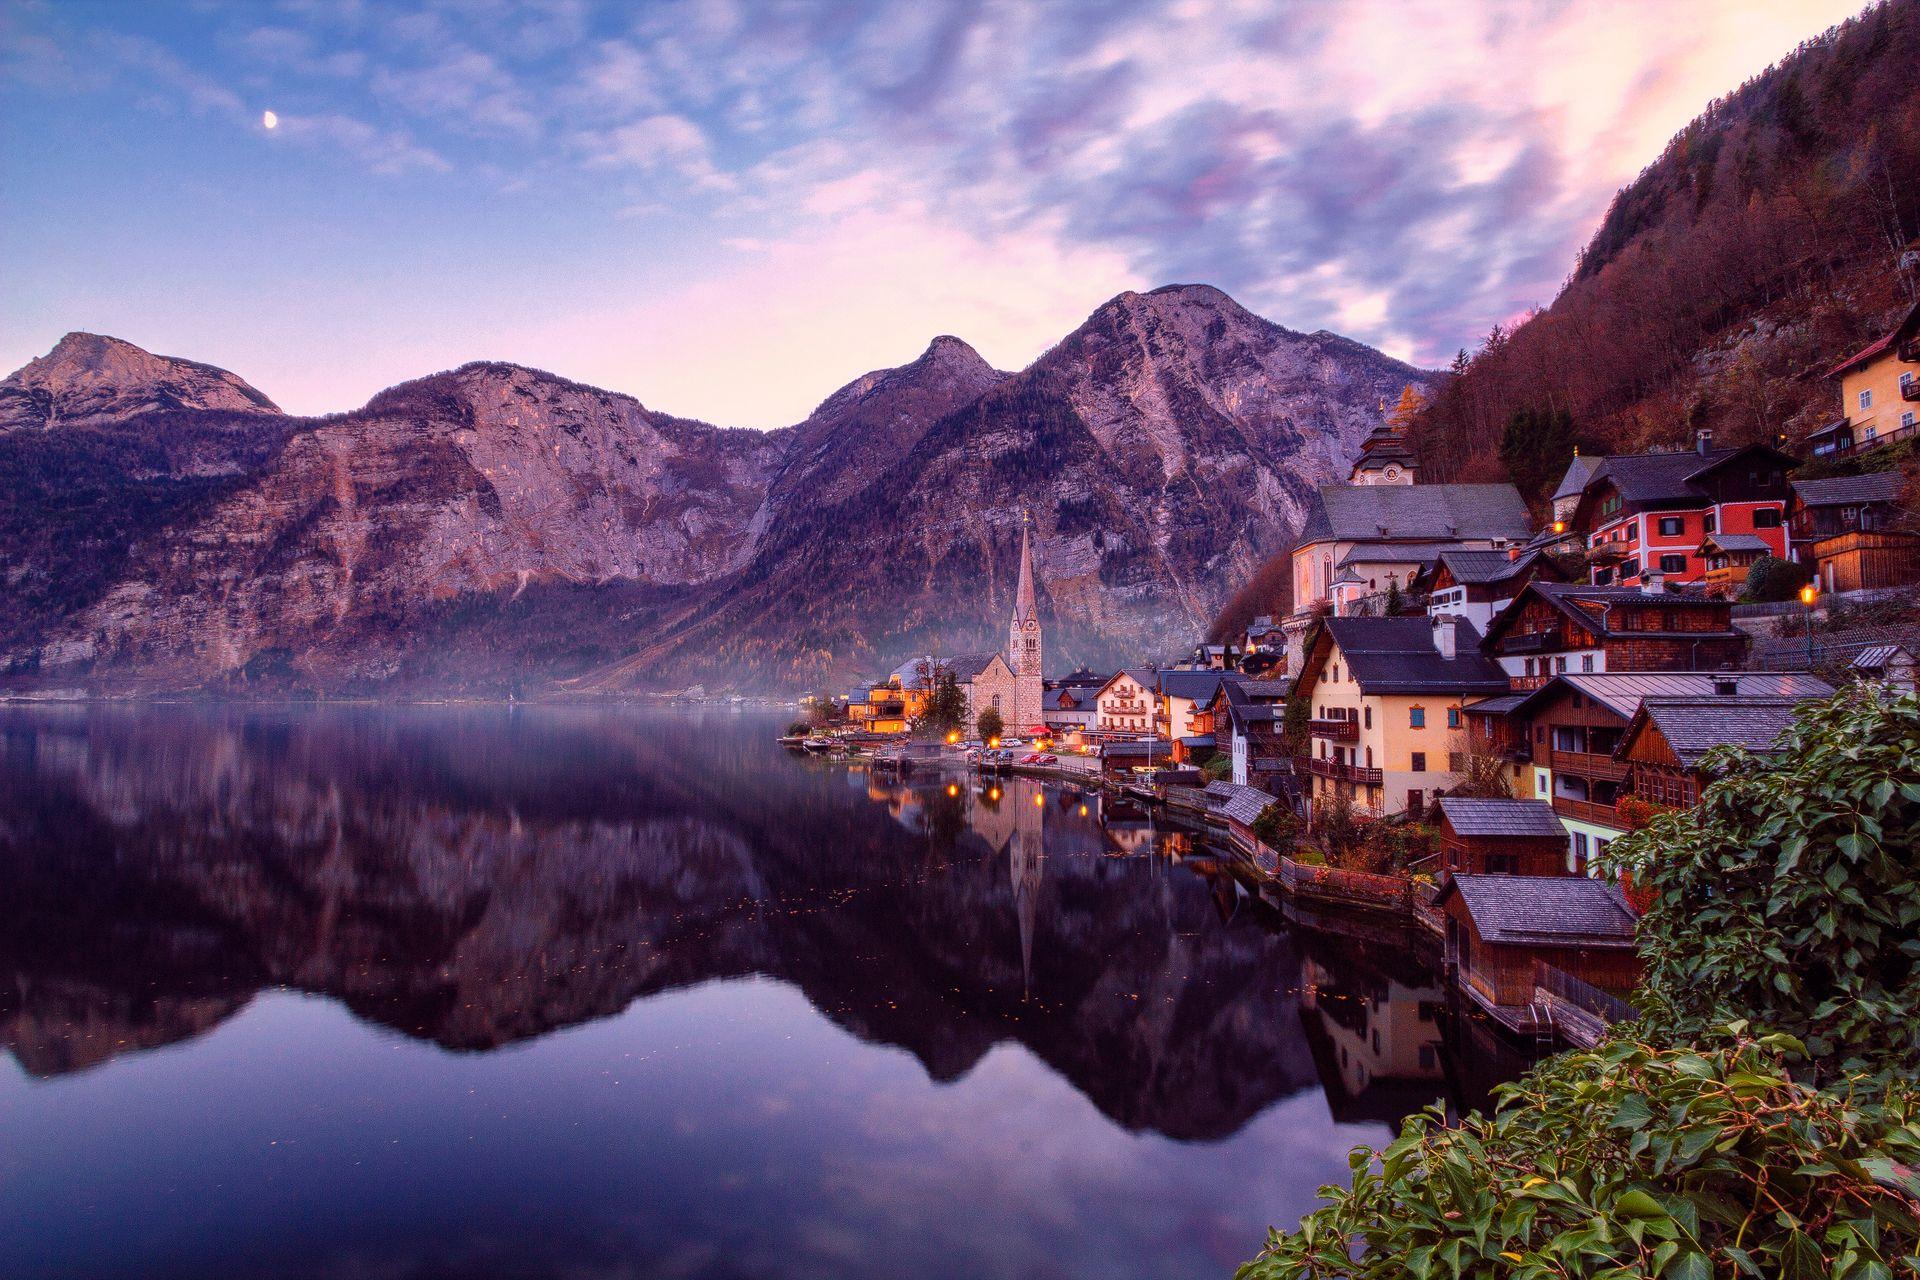 Lake Reflection, village, church, Hallstatt, Salzkammergut, Austria